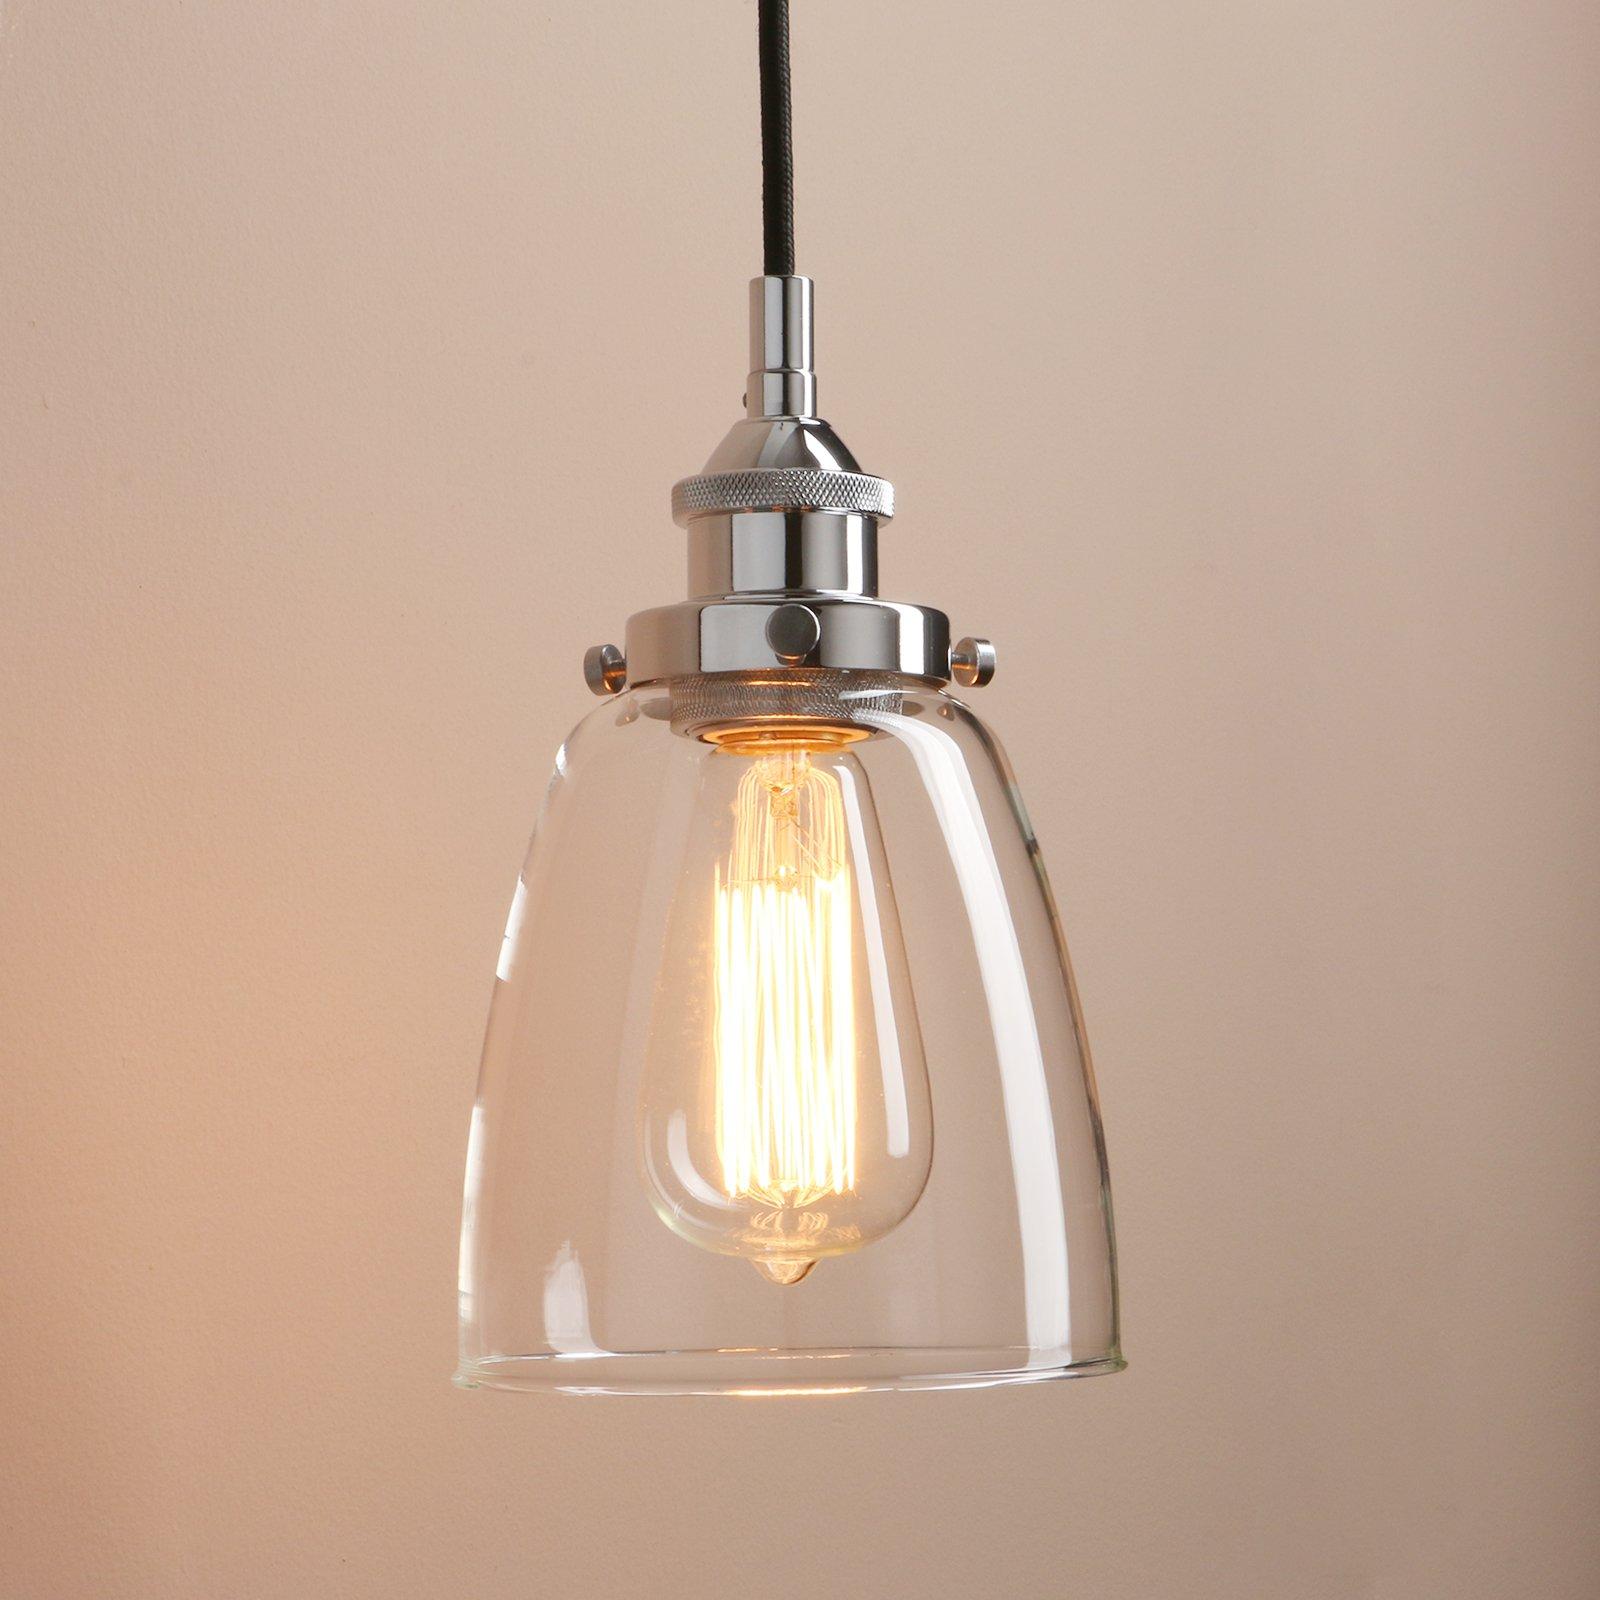 Cheap Retro Hanging Light Fixtures, find Retro Hanging Light ...